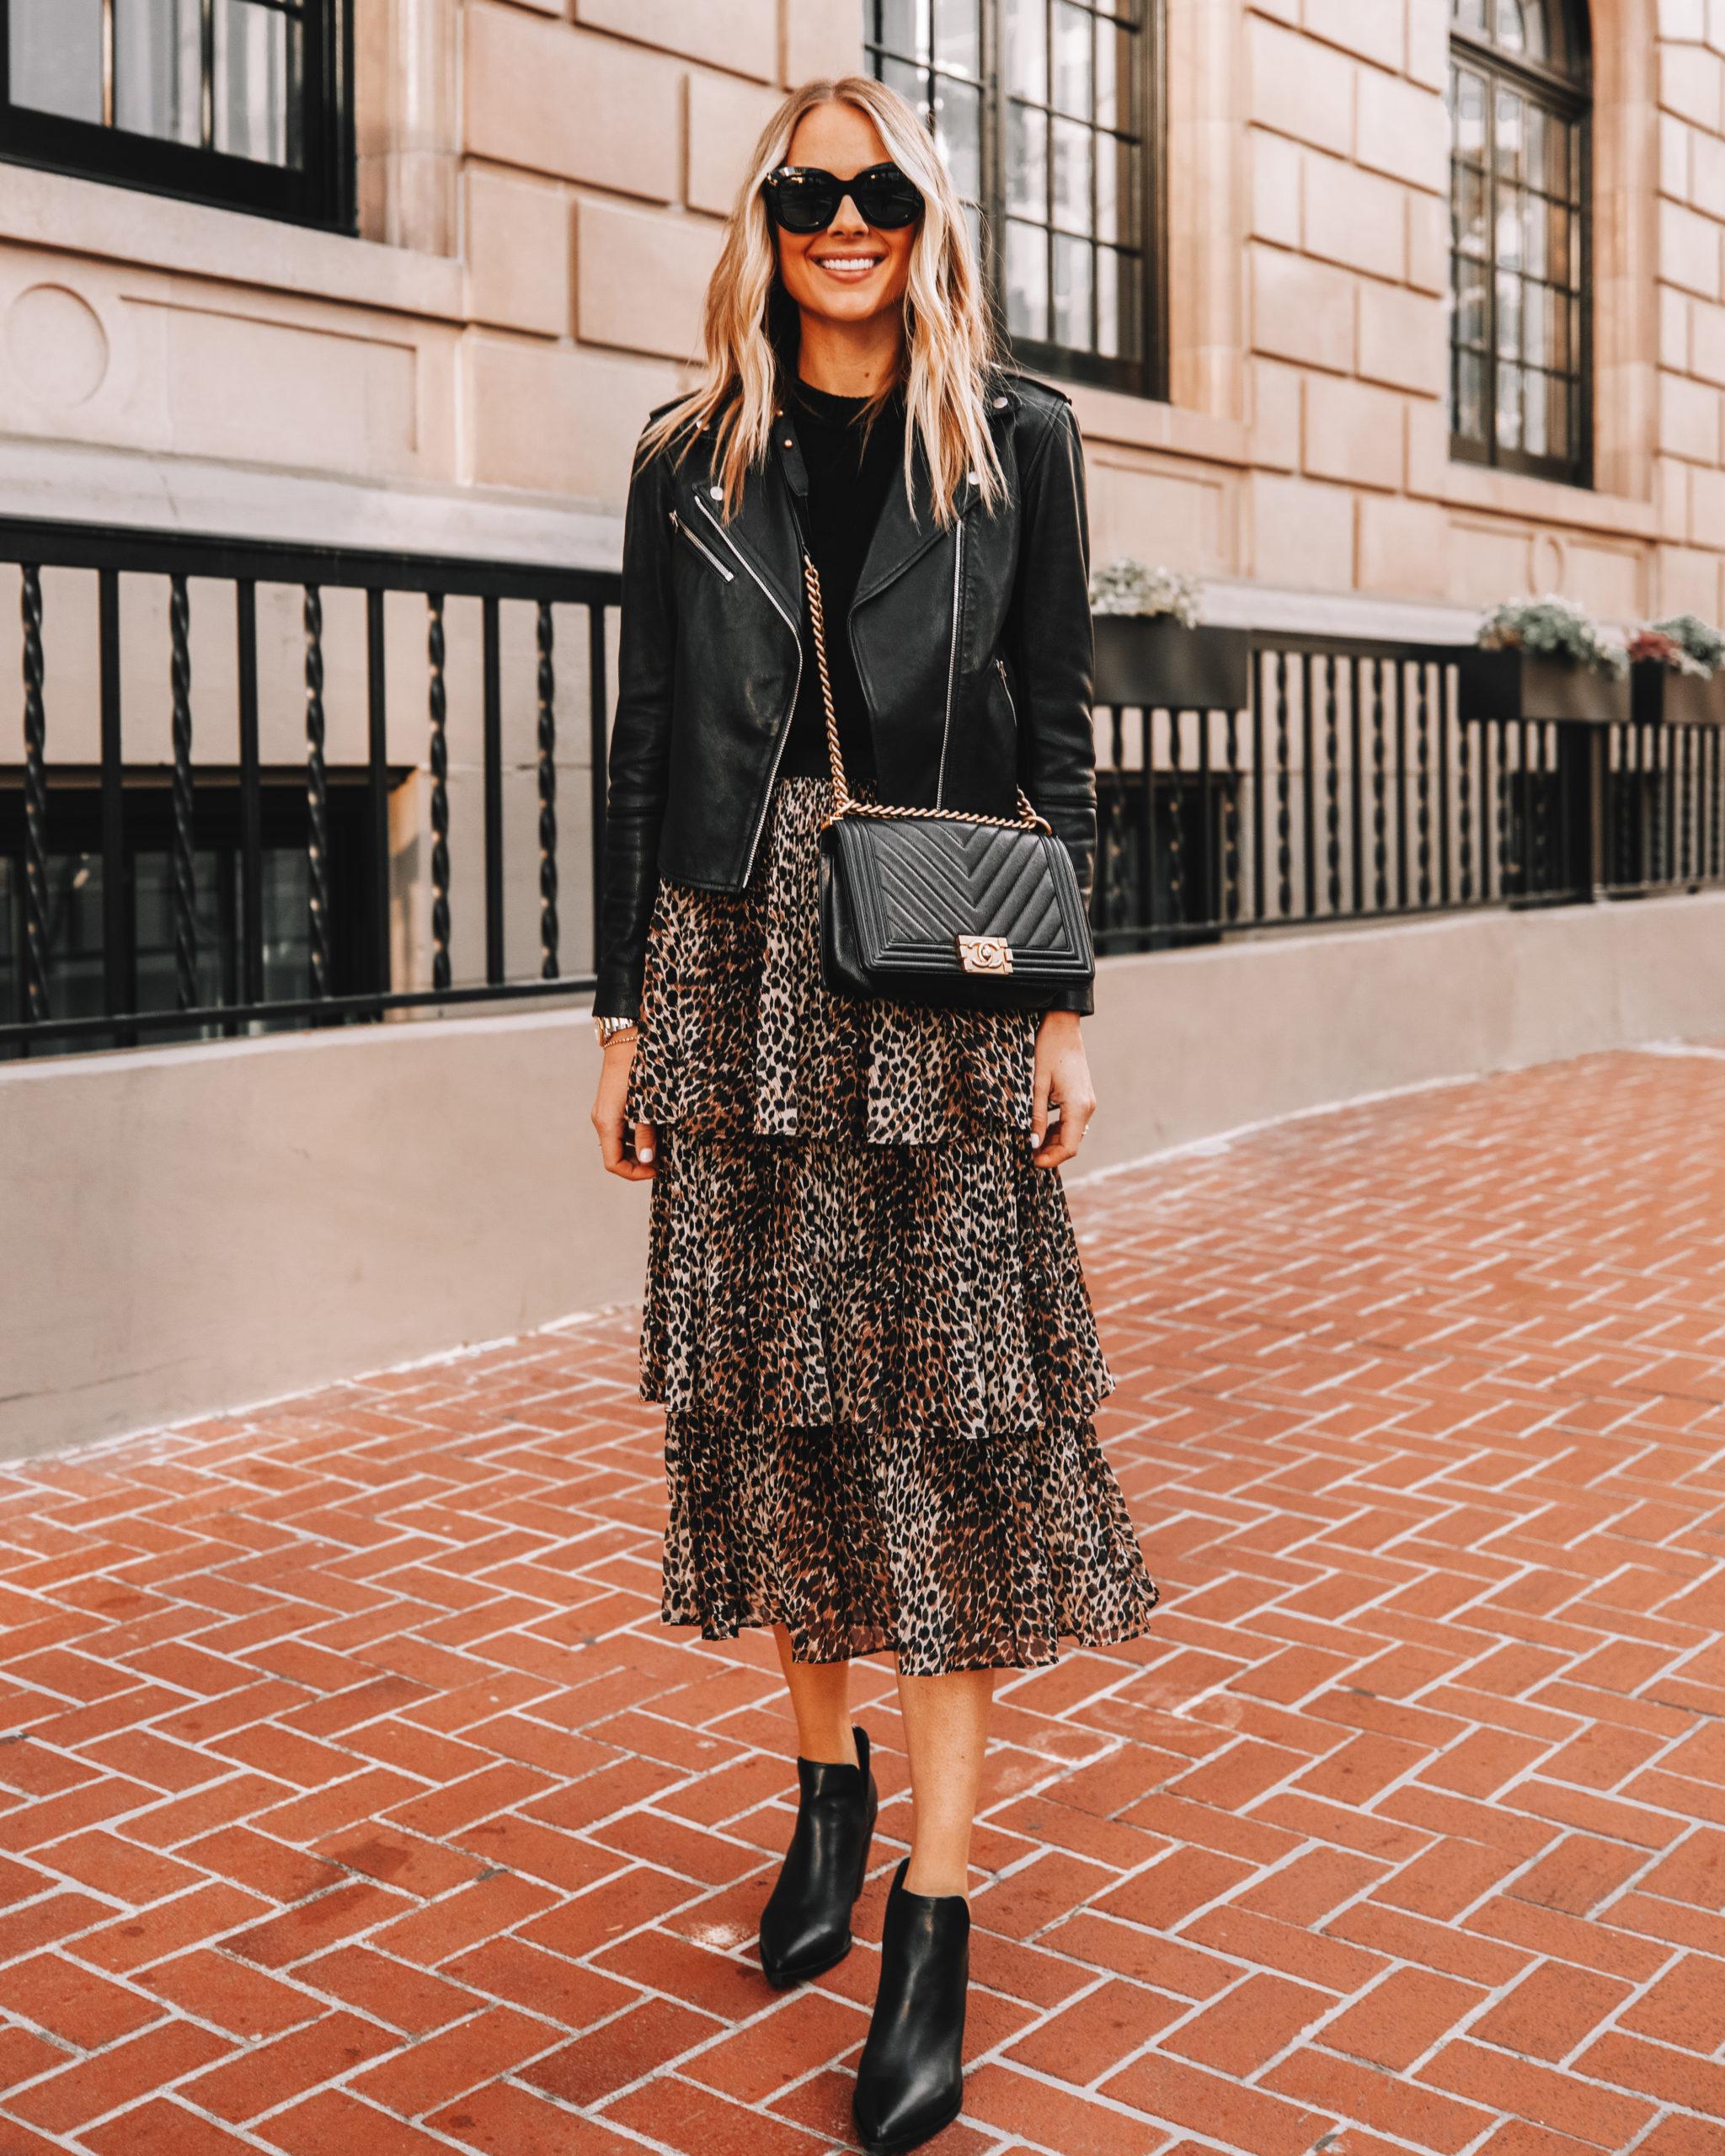 Fashion Jackson Wearing Black Leather Jacket Black Leopard Midi Skirt Black Booties Black Chanel Boy Bag